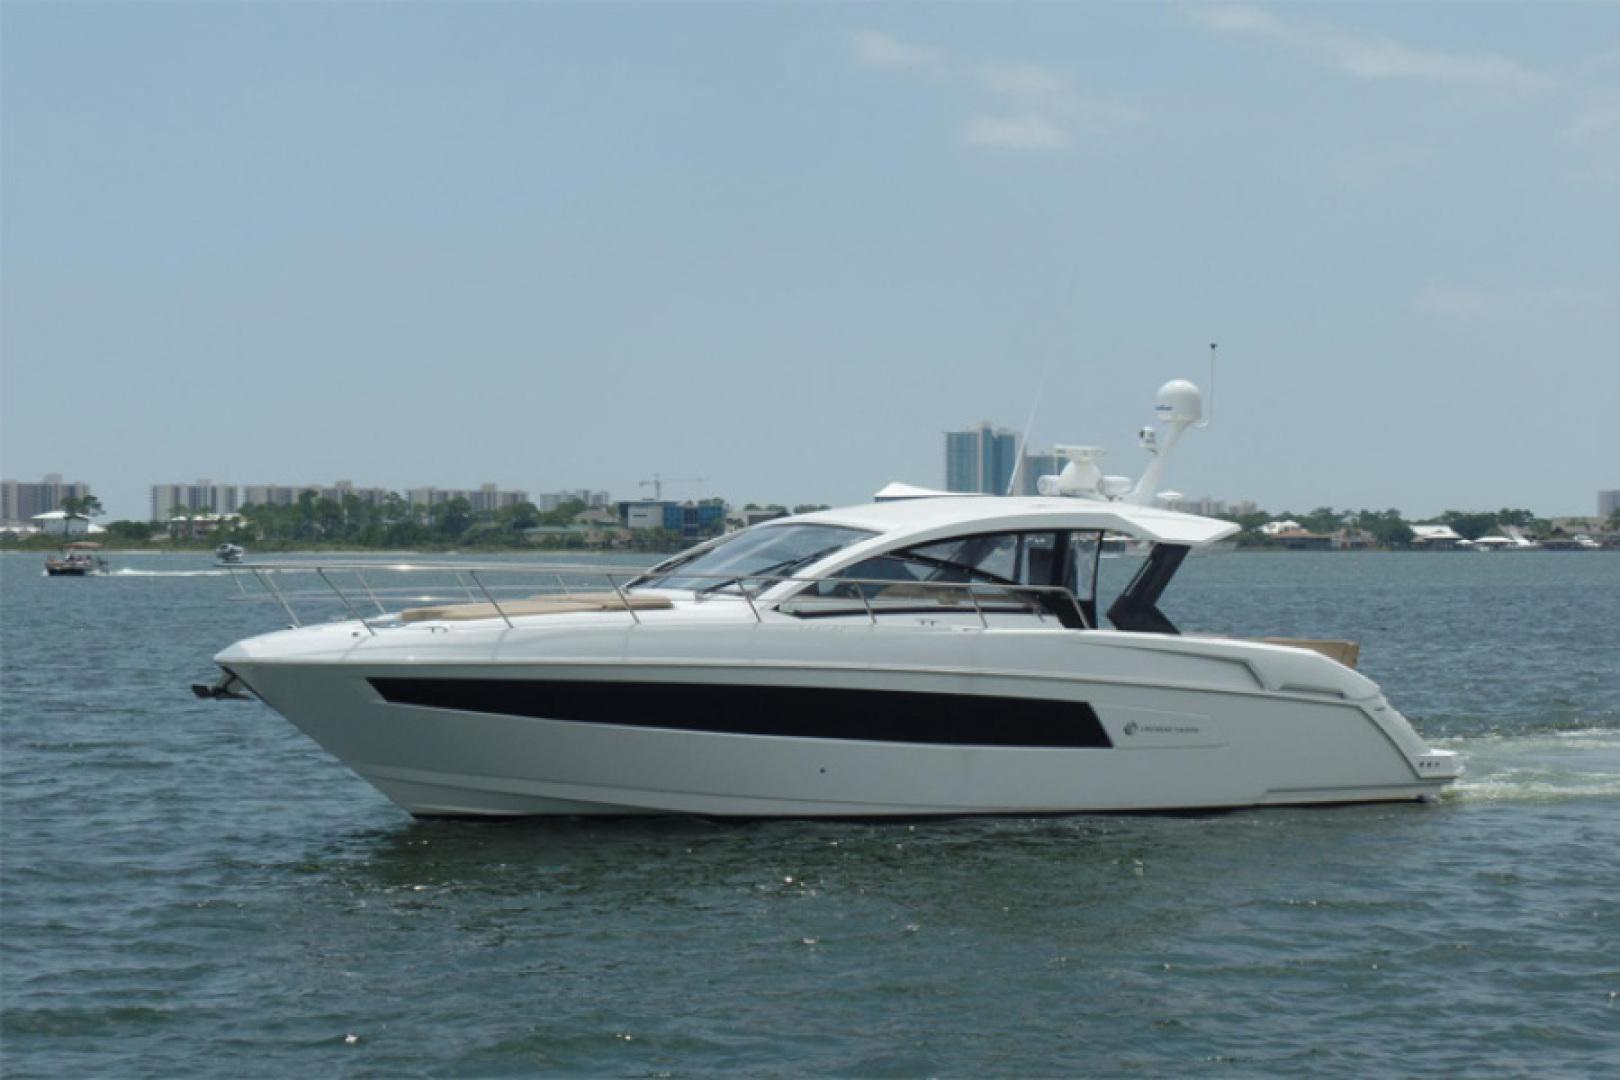 Cruisers-39 Express Coupe 2015-Tranquila Palm Beach-Florida-United States-39 Cruisers Port profile-1408647 | Thumbnail